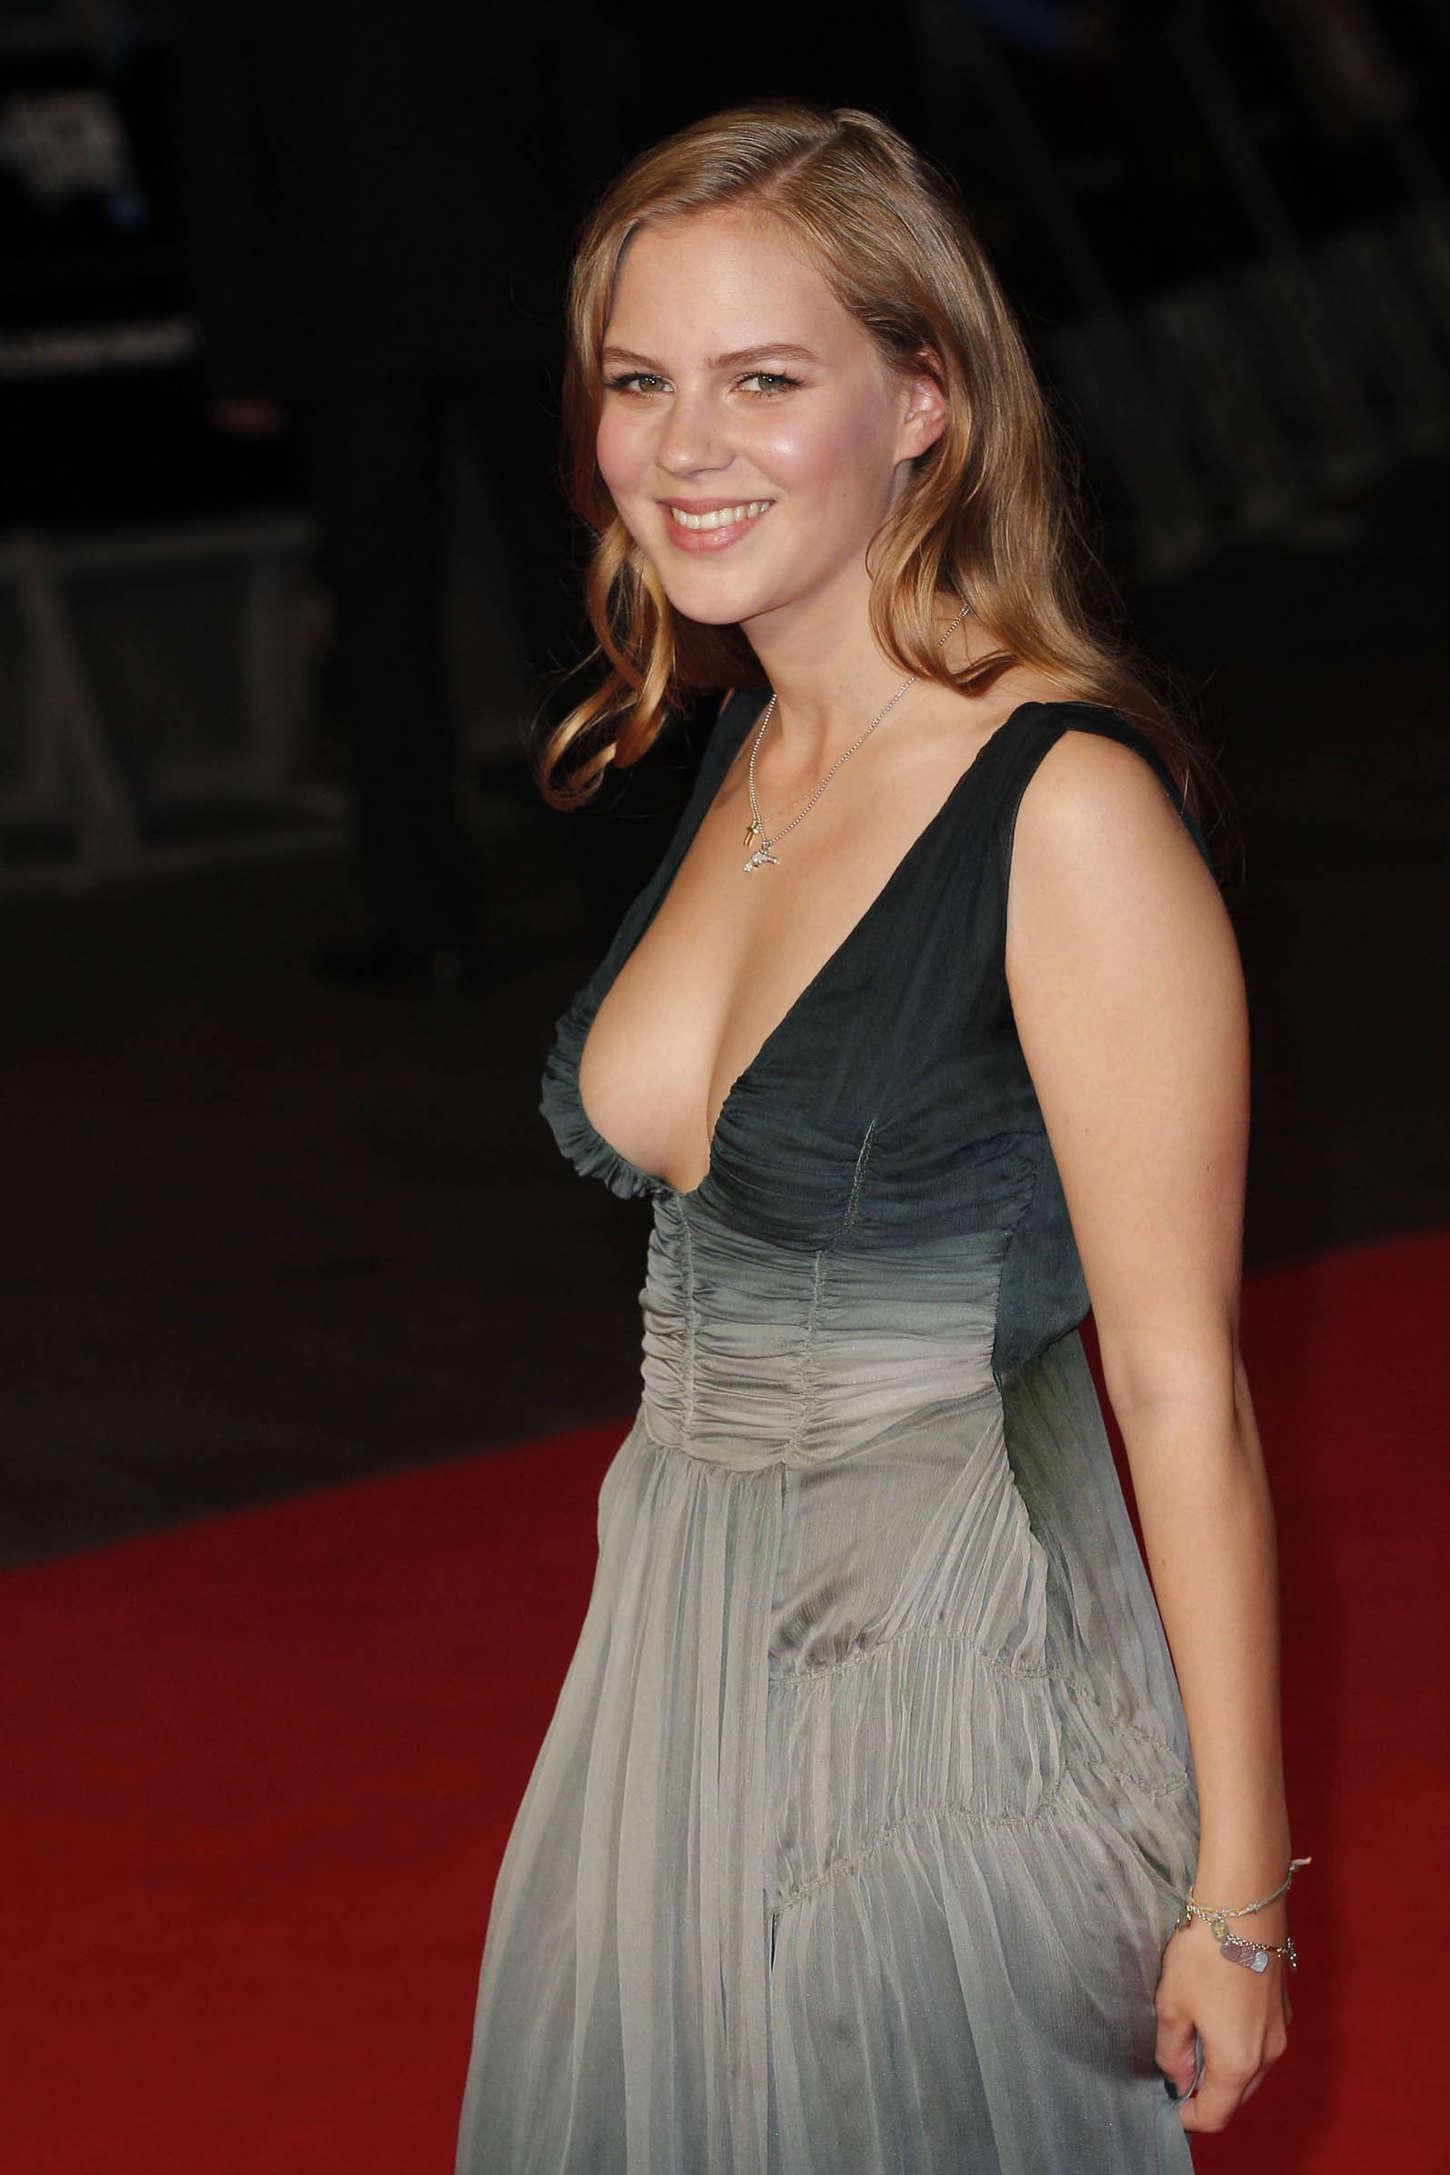 Alicia von Rittberg Nude Photos 36